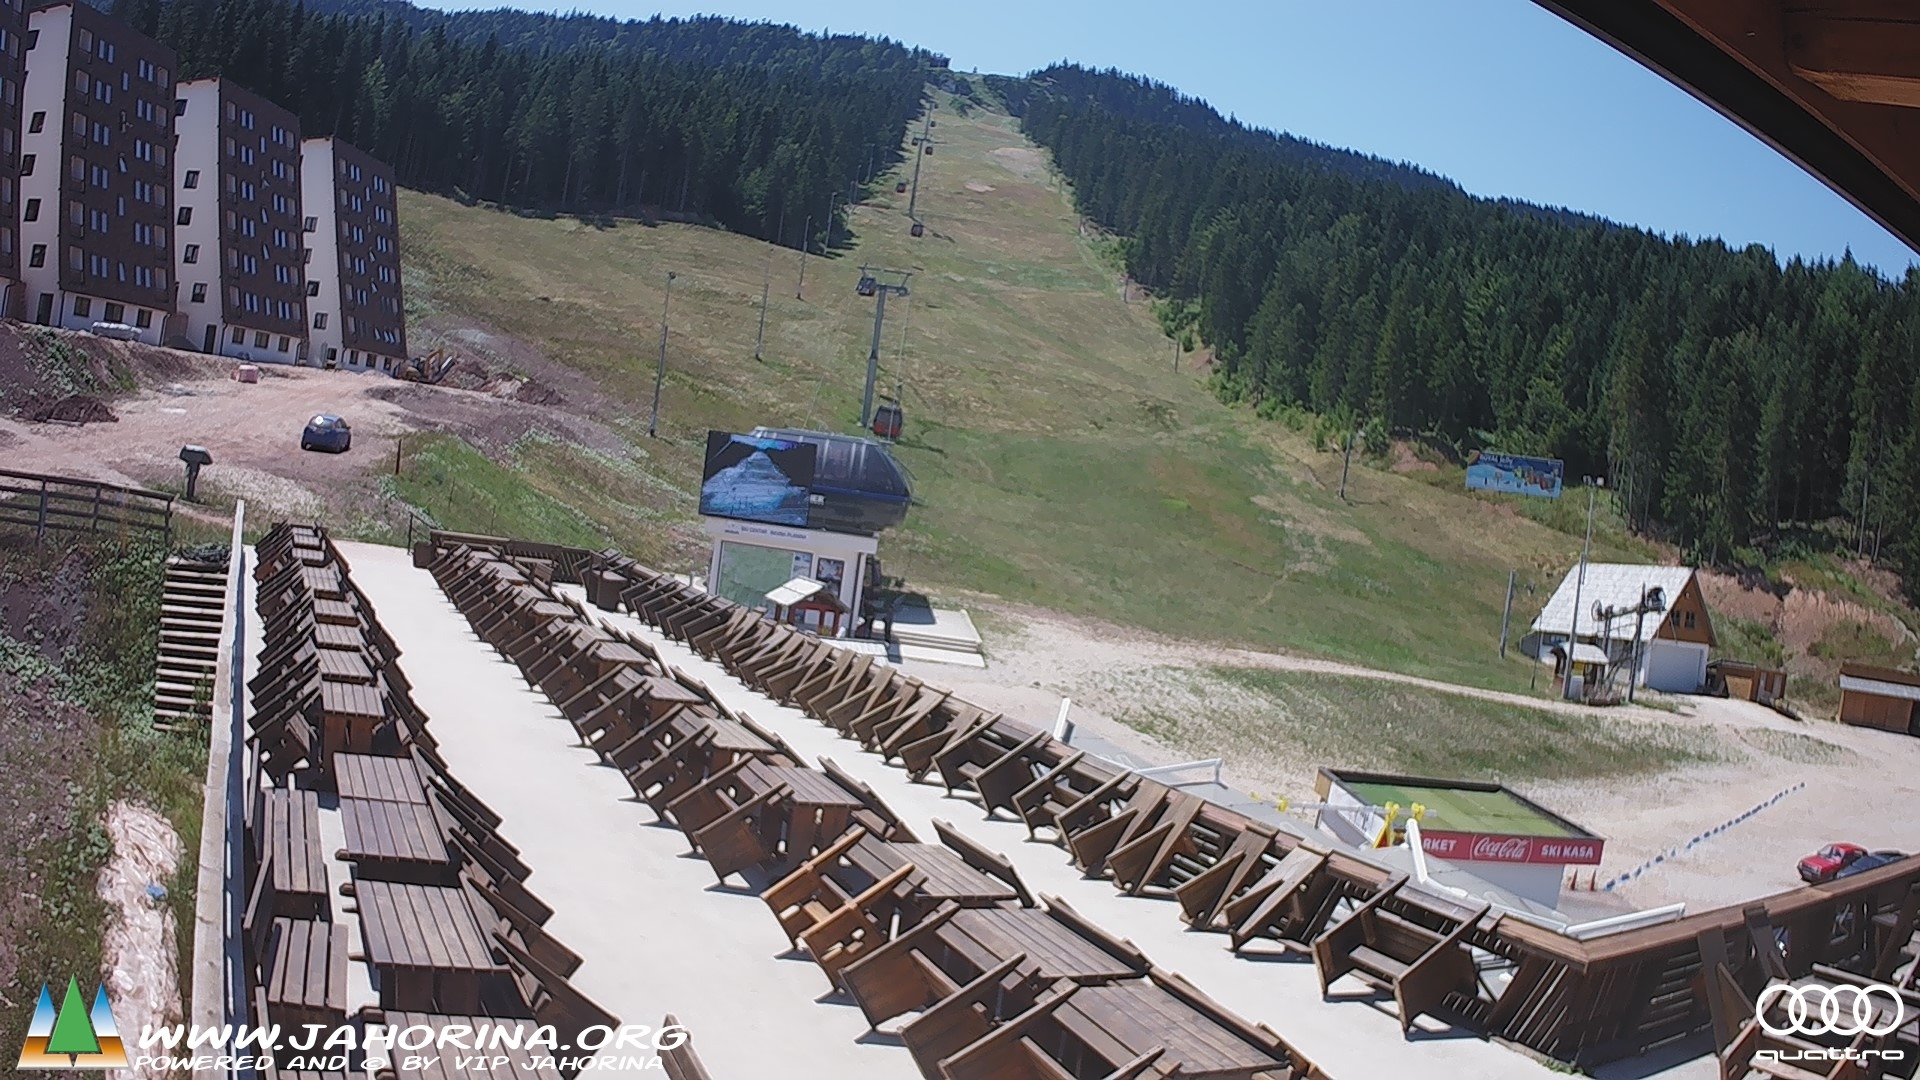 Web cam Ravna planina start station